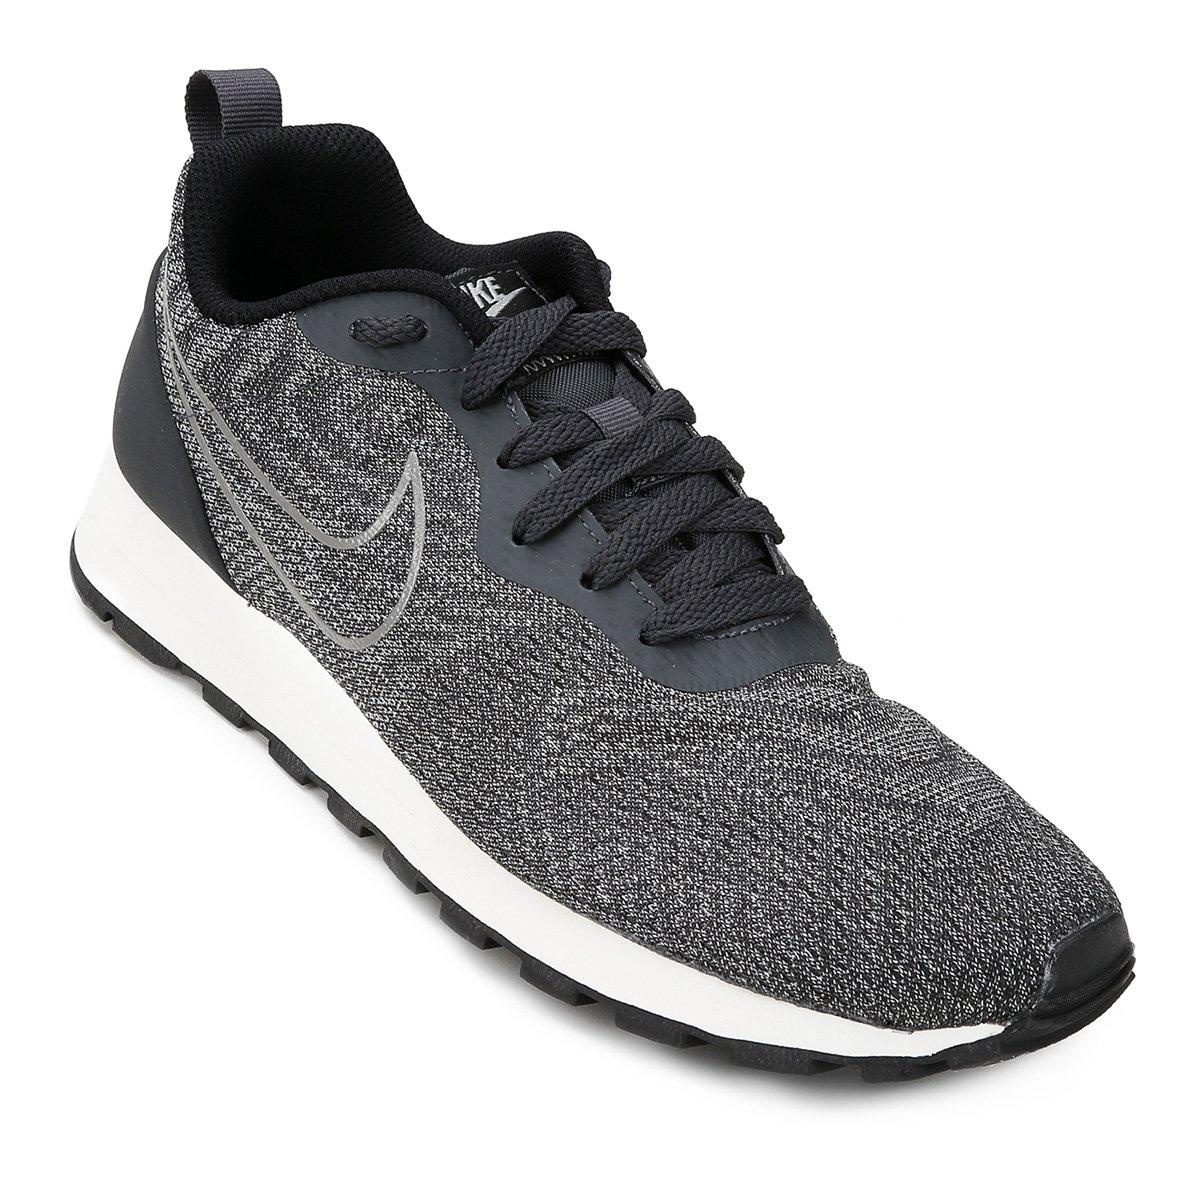 737ce1e017 Tênis Nike Md Runner 2 Eng Mesh Feminino - Chumbo e Preto - Compre Agora